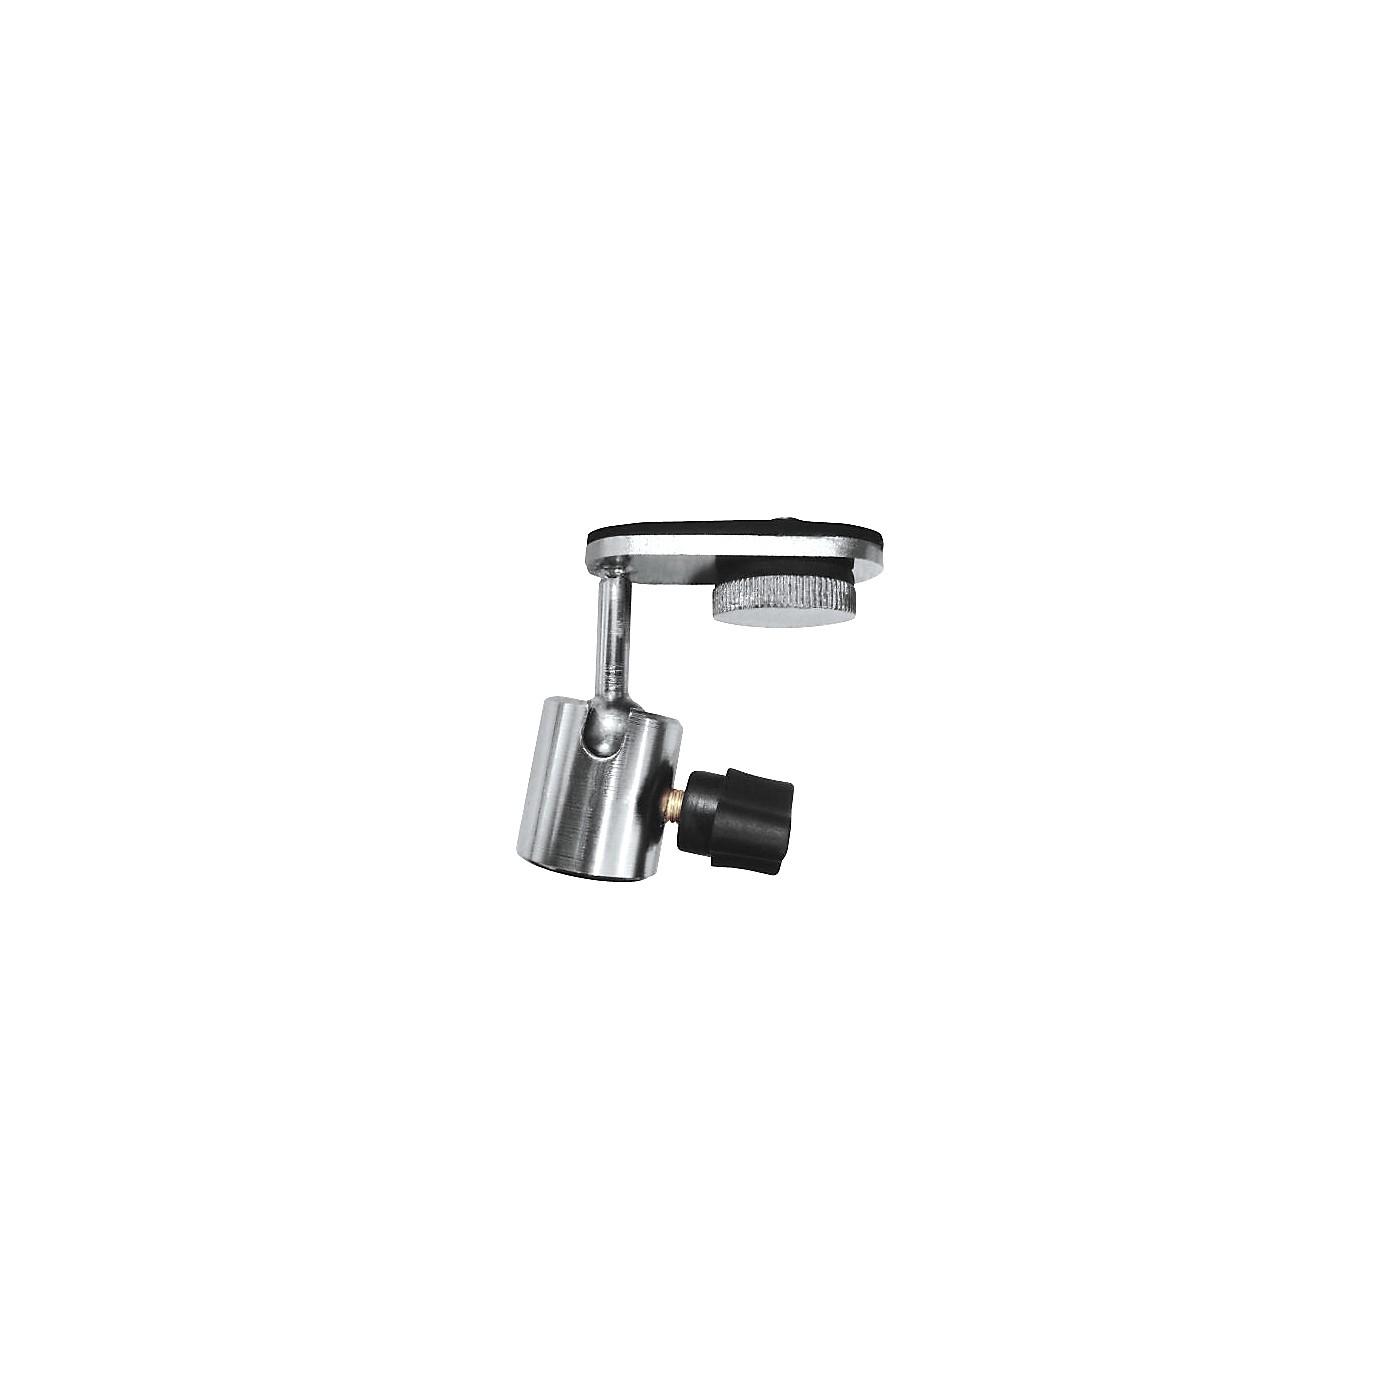 Musician's Gear Camera Mount Adapter thumbnail